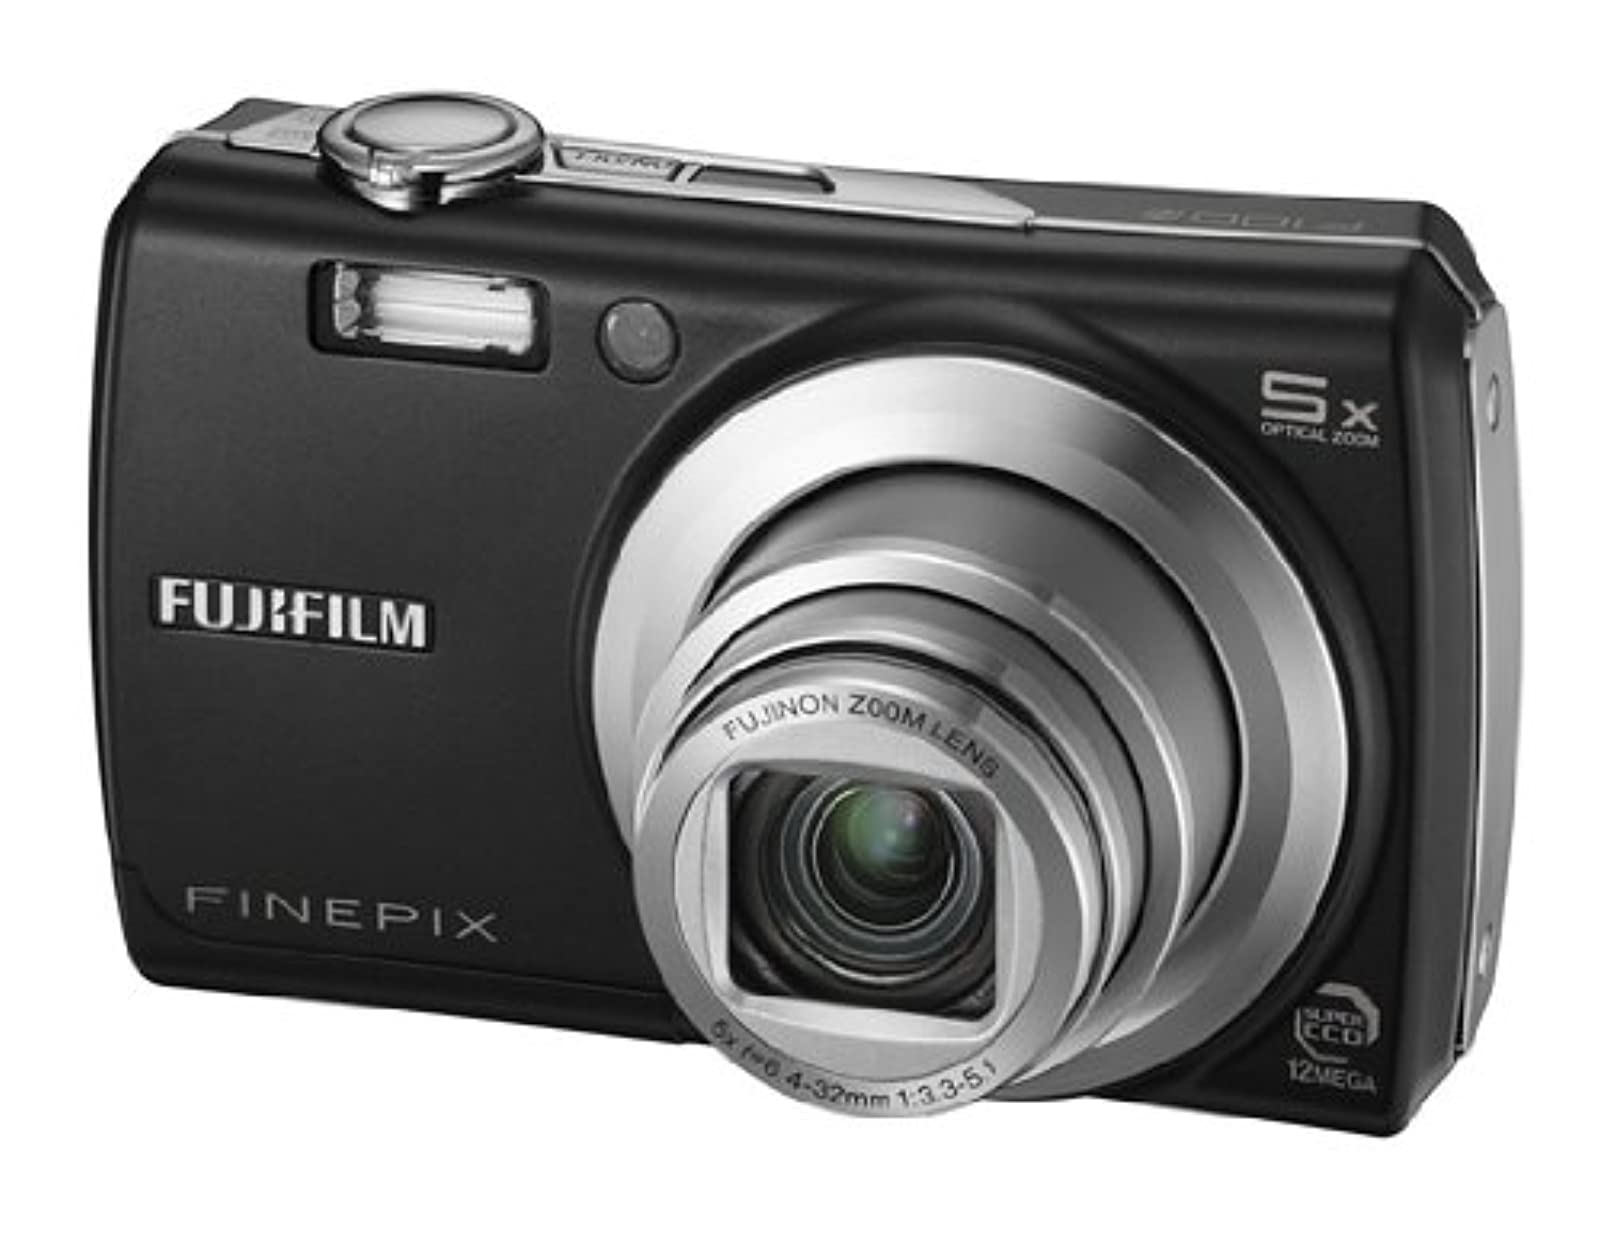 FujiFilm FinePix J10 8.2MP Digital Camera With 3X Optical Zoom Matte Black